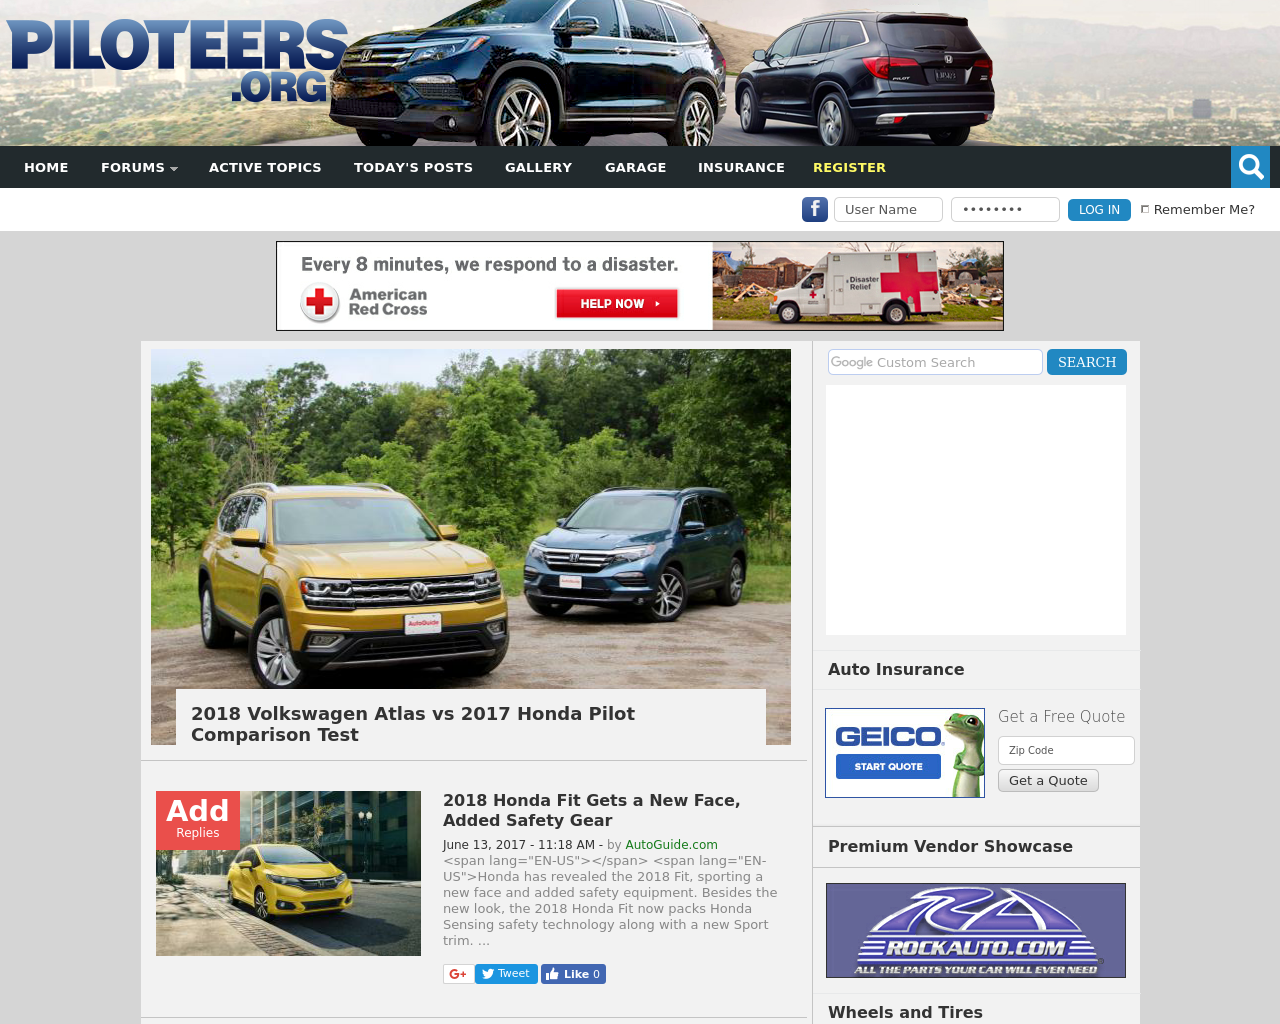 Honda-Pilot-Forums-Advertising-Reviews-Pricing